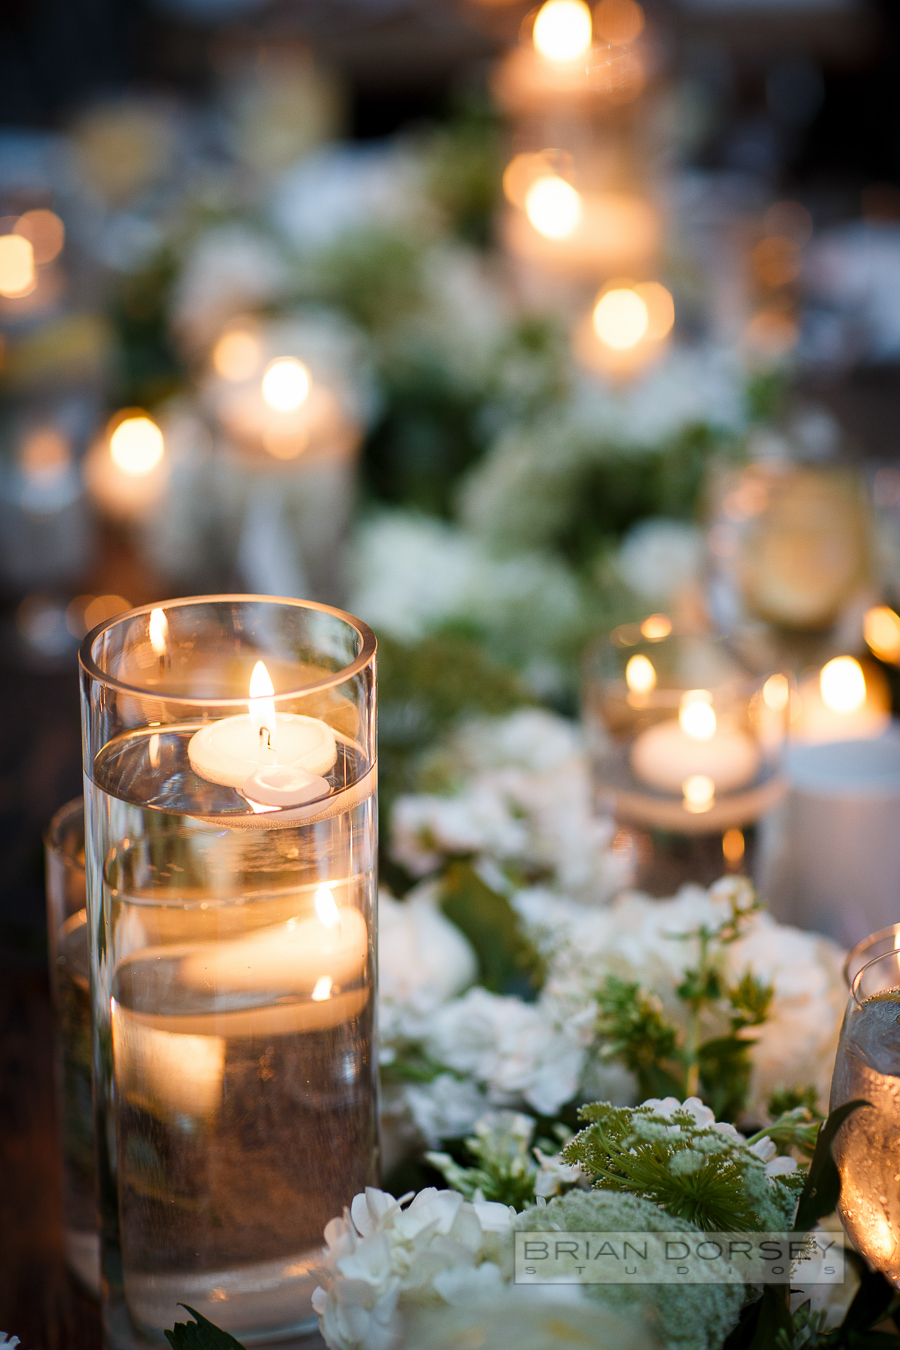 isola nomo soho hotel wedding brian dorsey studios ang weddings and events-32.jpg